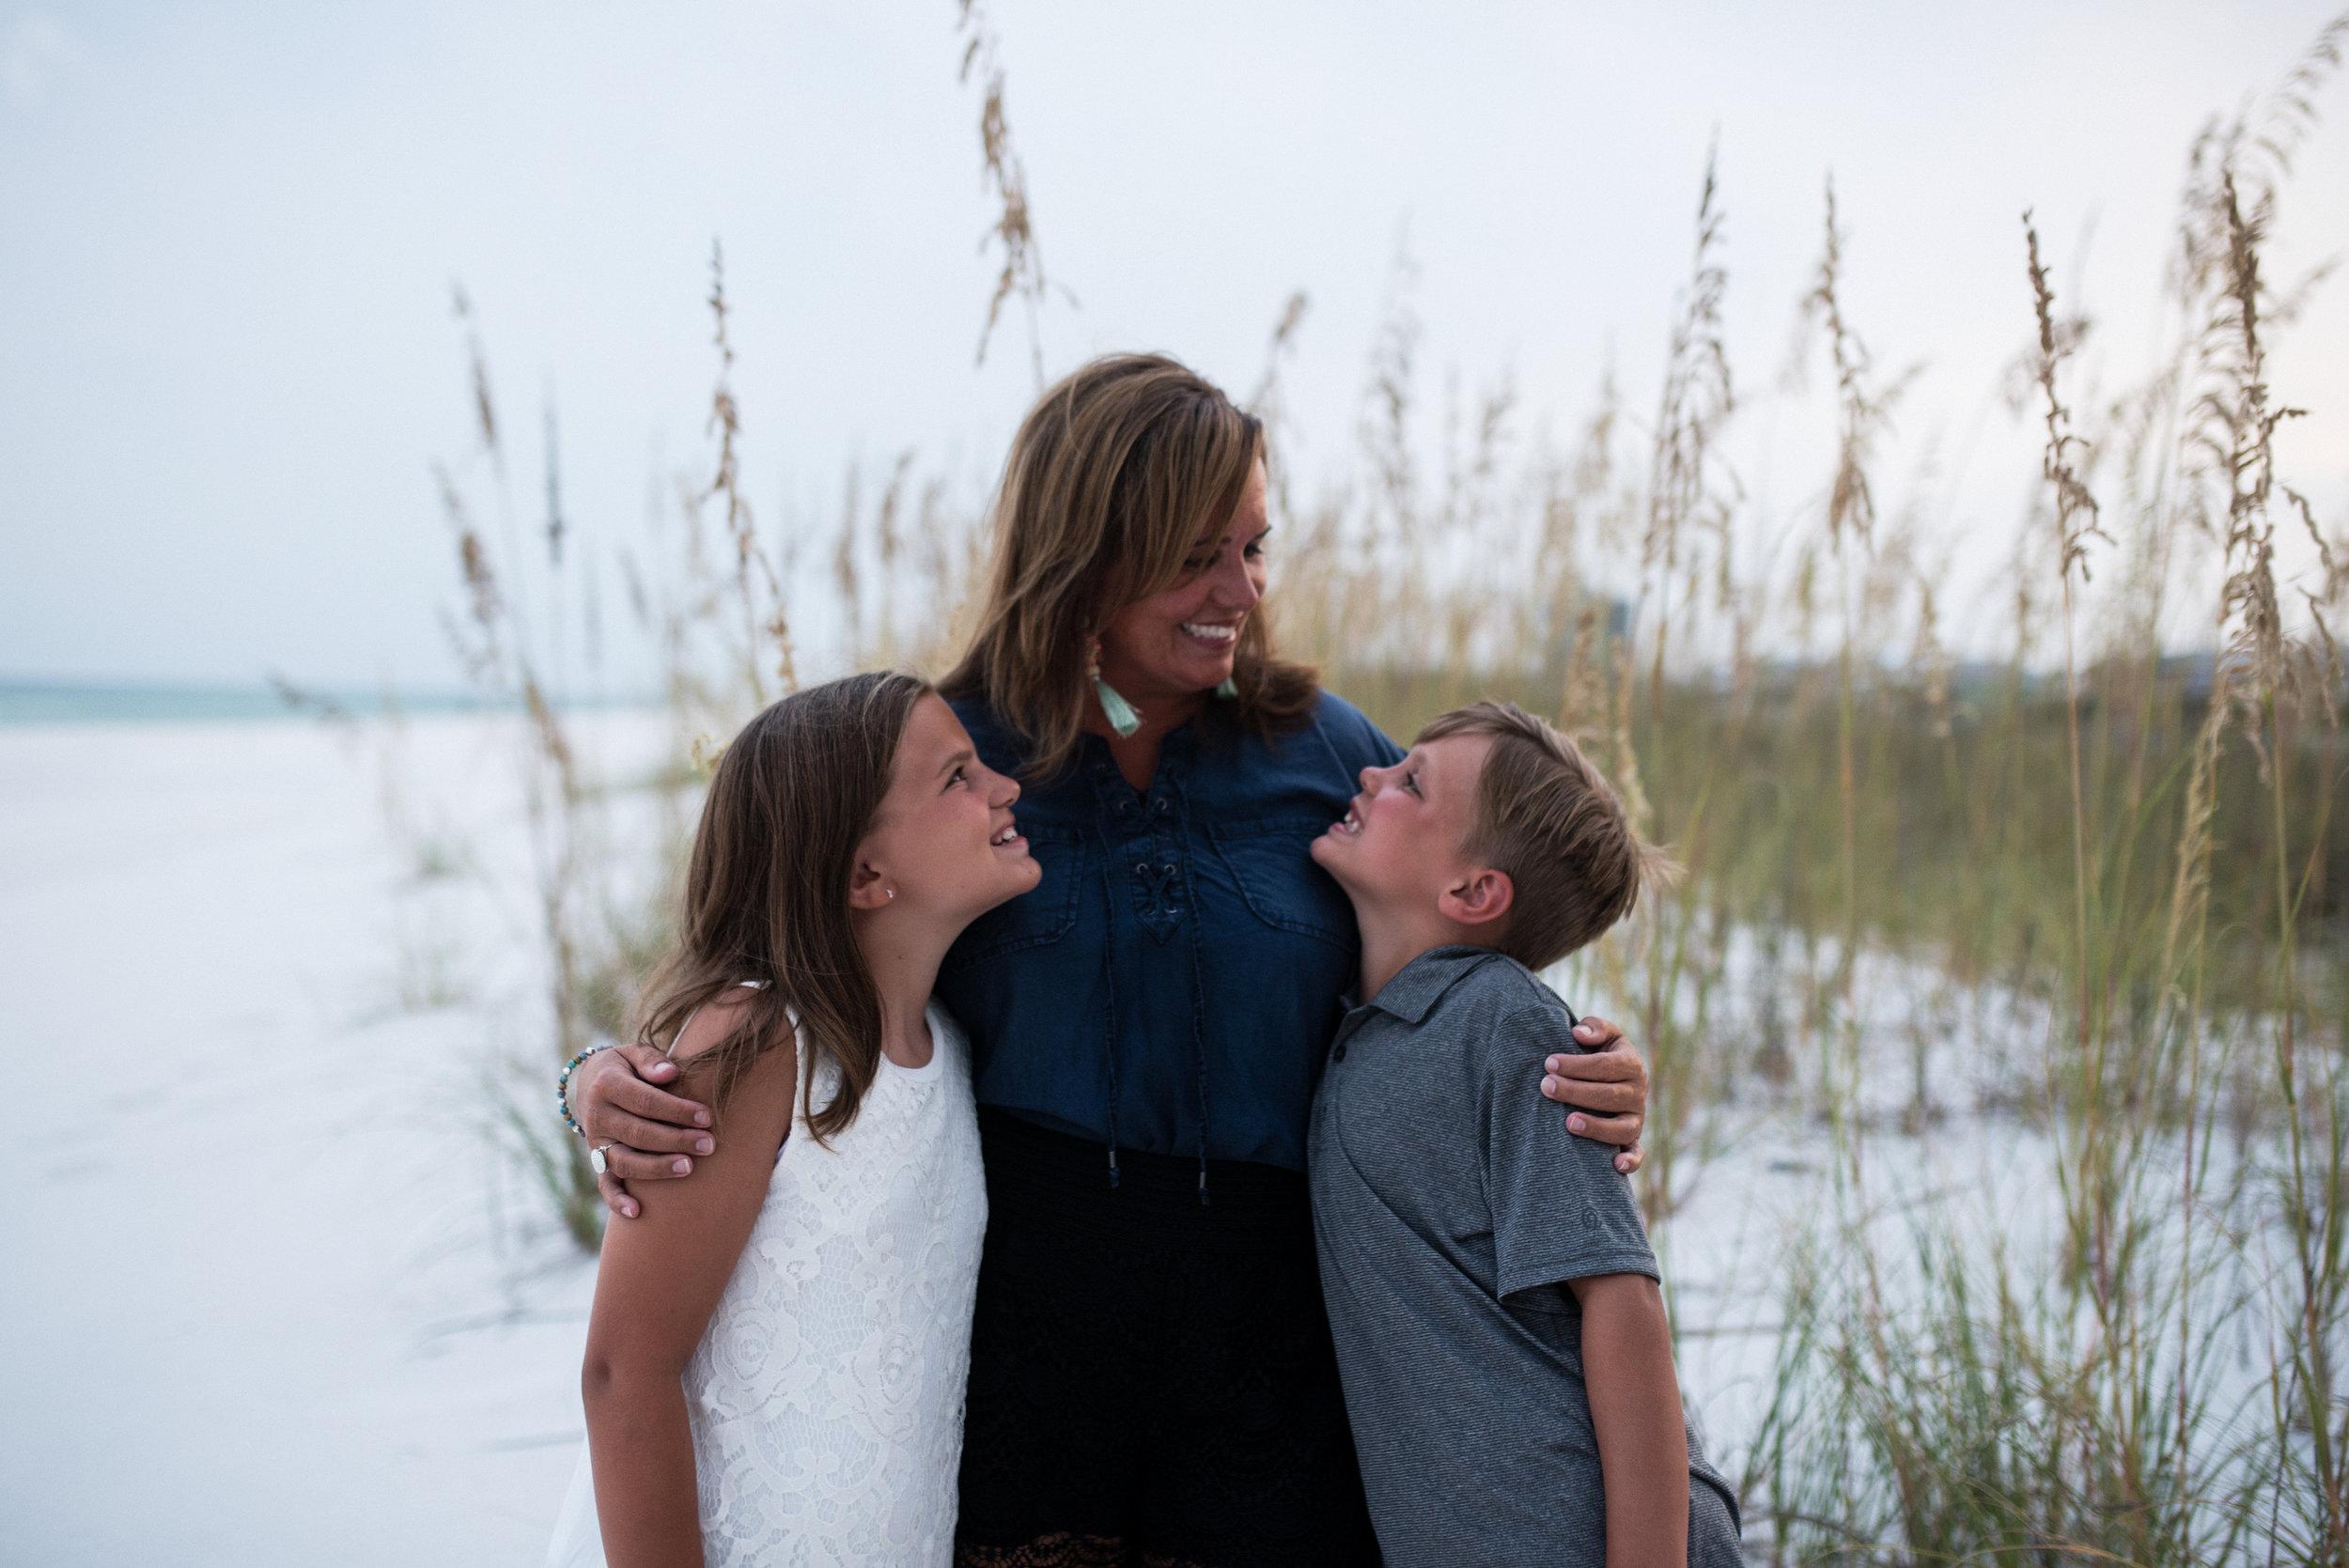 Kristin Grover Images. Beach Family Photographer. Pensacola, FL